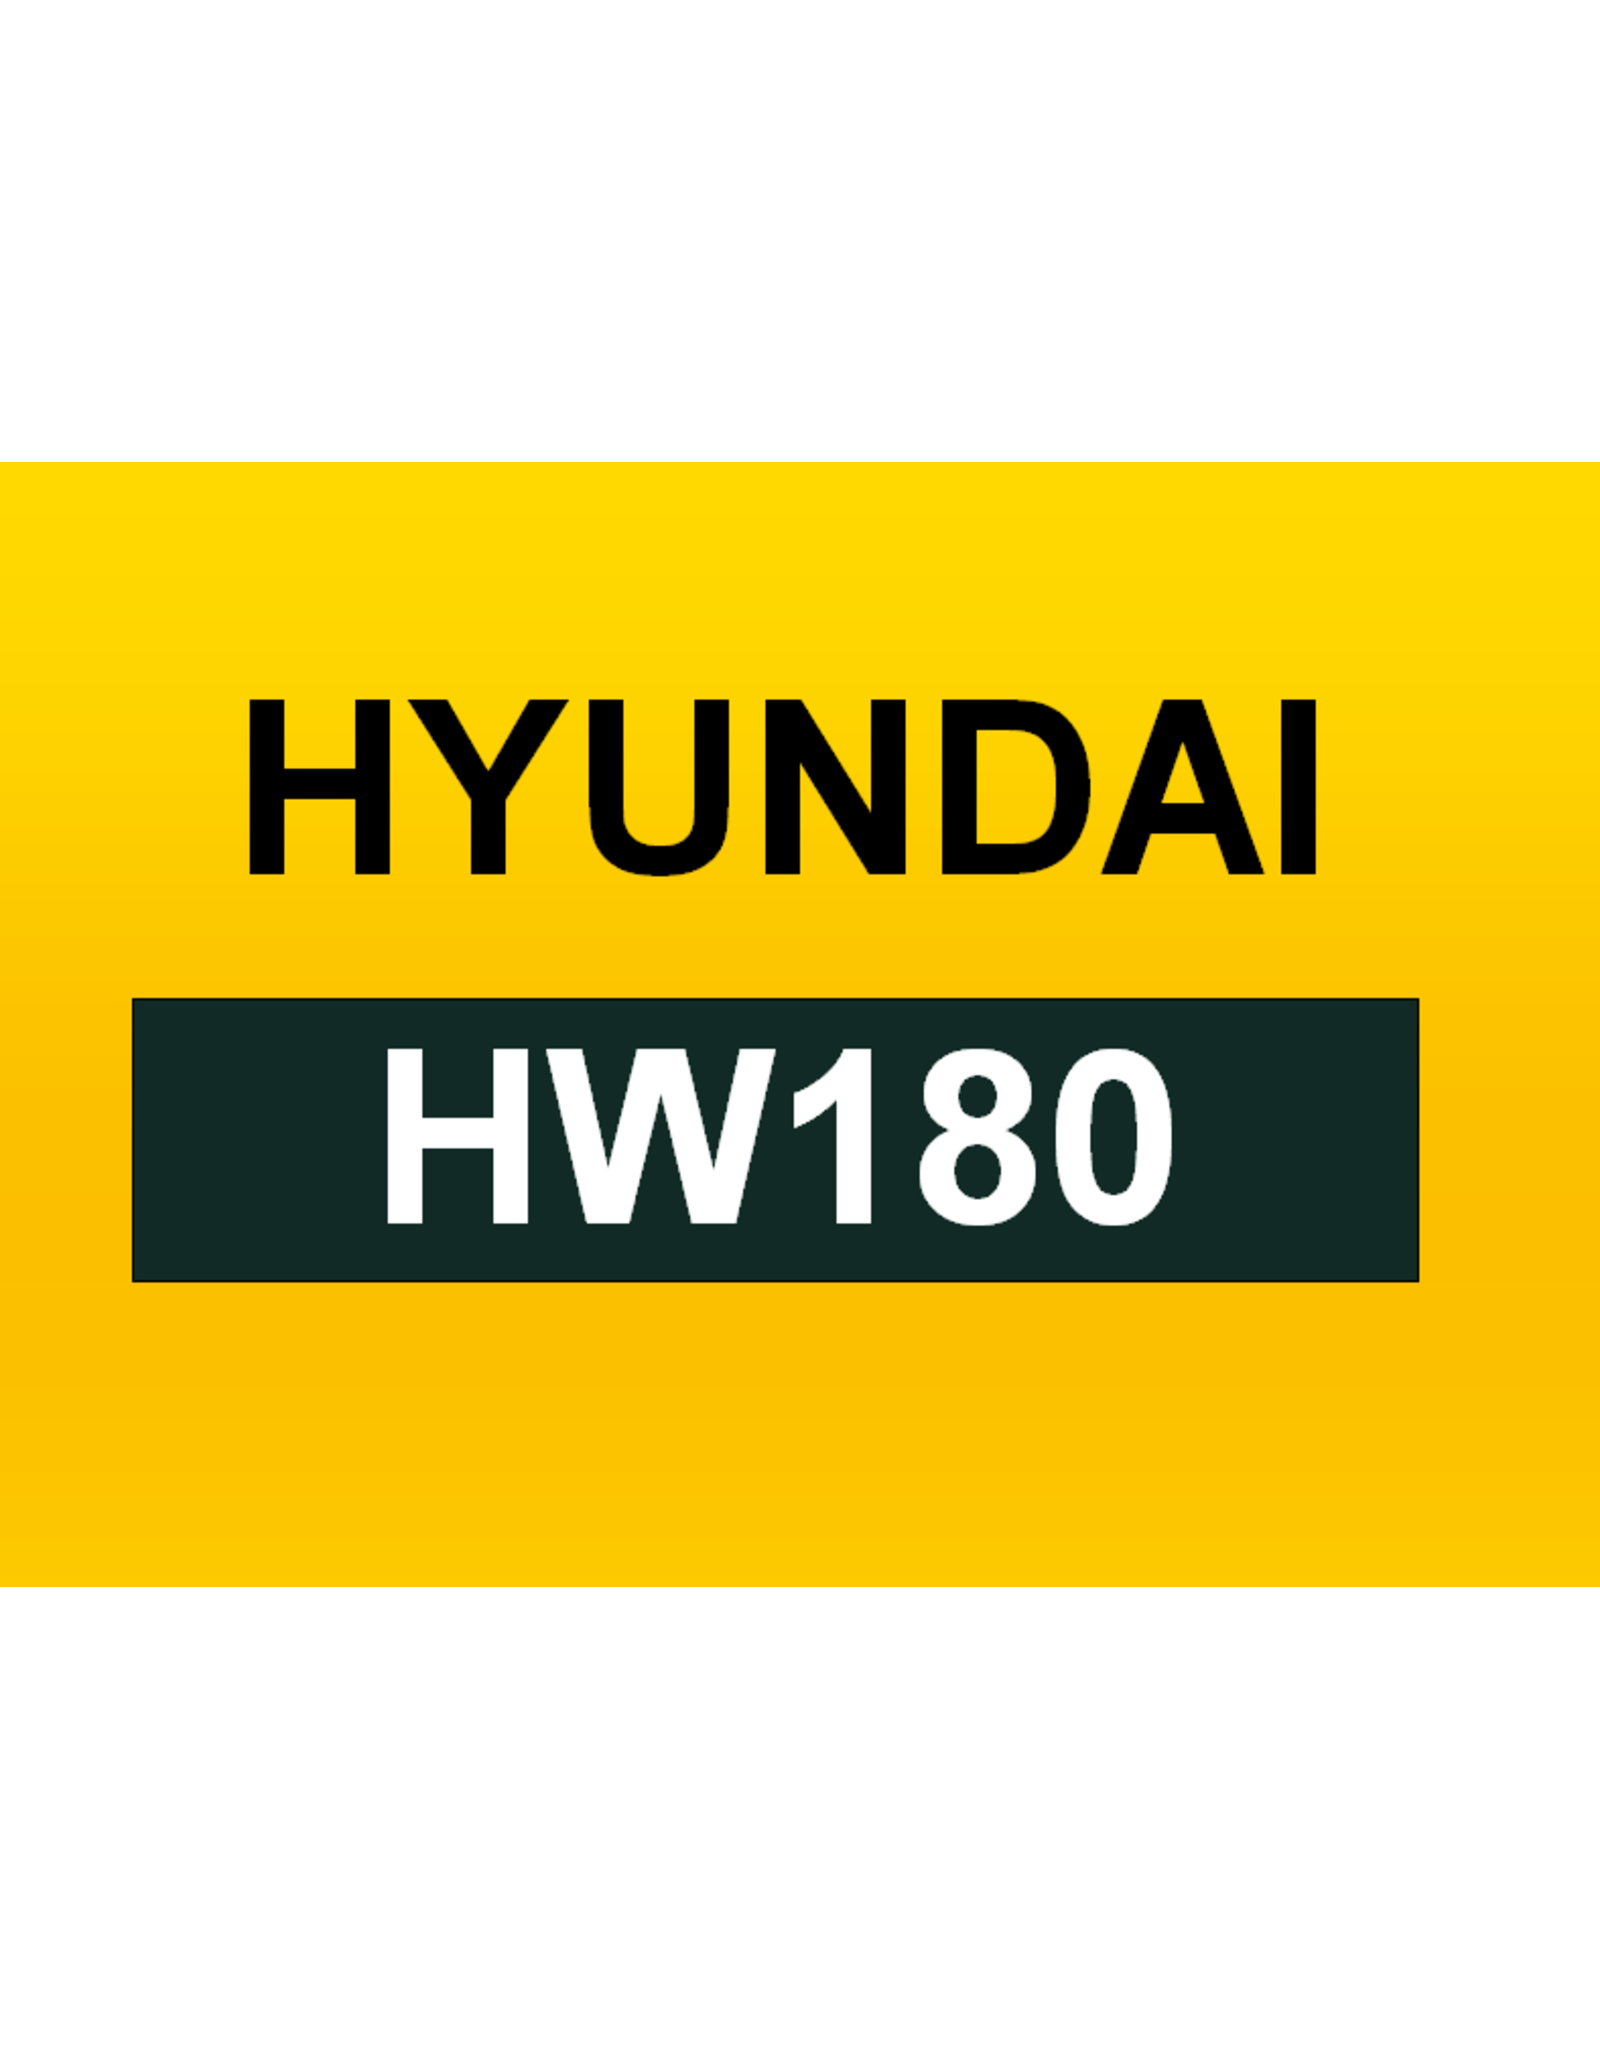 Echle Hartstahl GmbH FOPS for Hyundai HW180